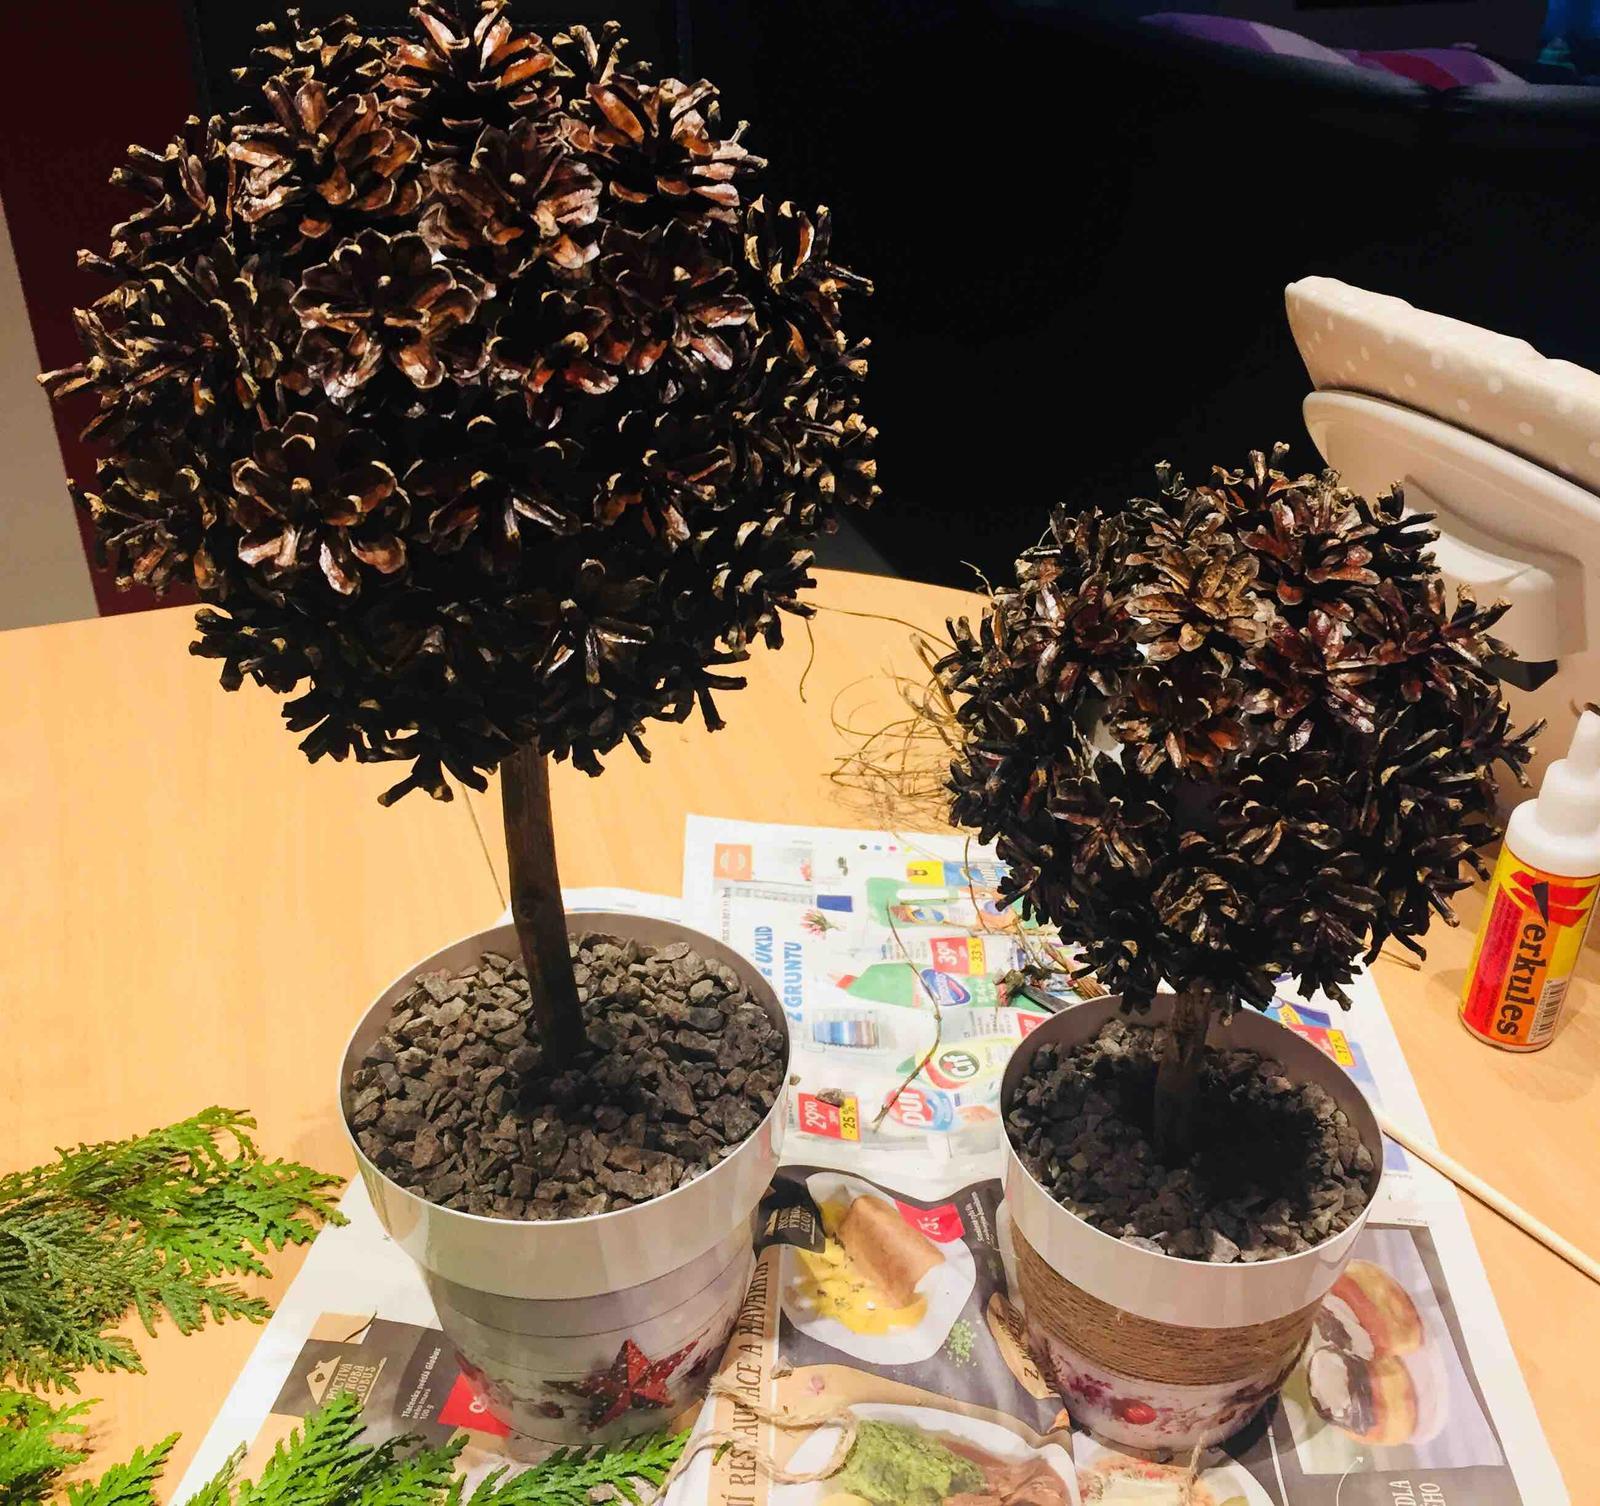 Miluji tvořit - Tak jsem stihla rovnou dva 🤗 jeste jim upravim kvetinace, striknu snehem a bude hotovo